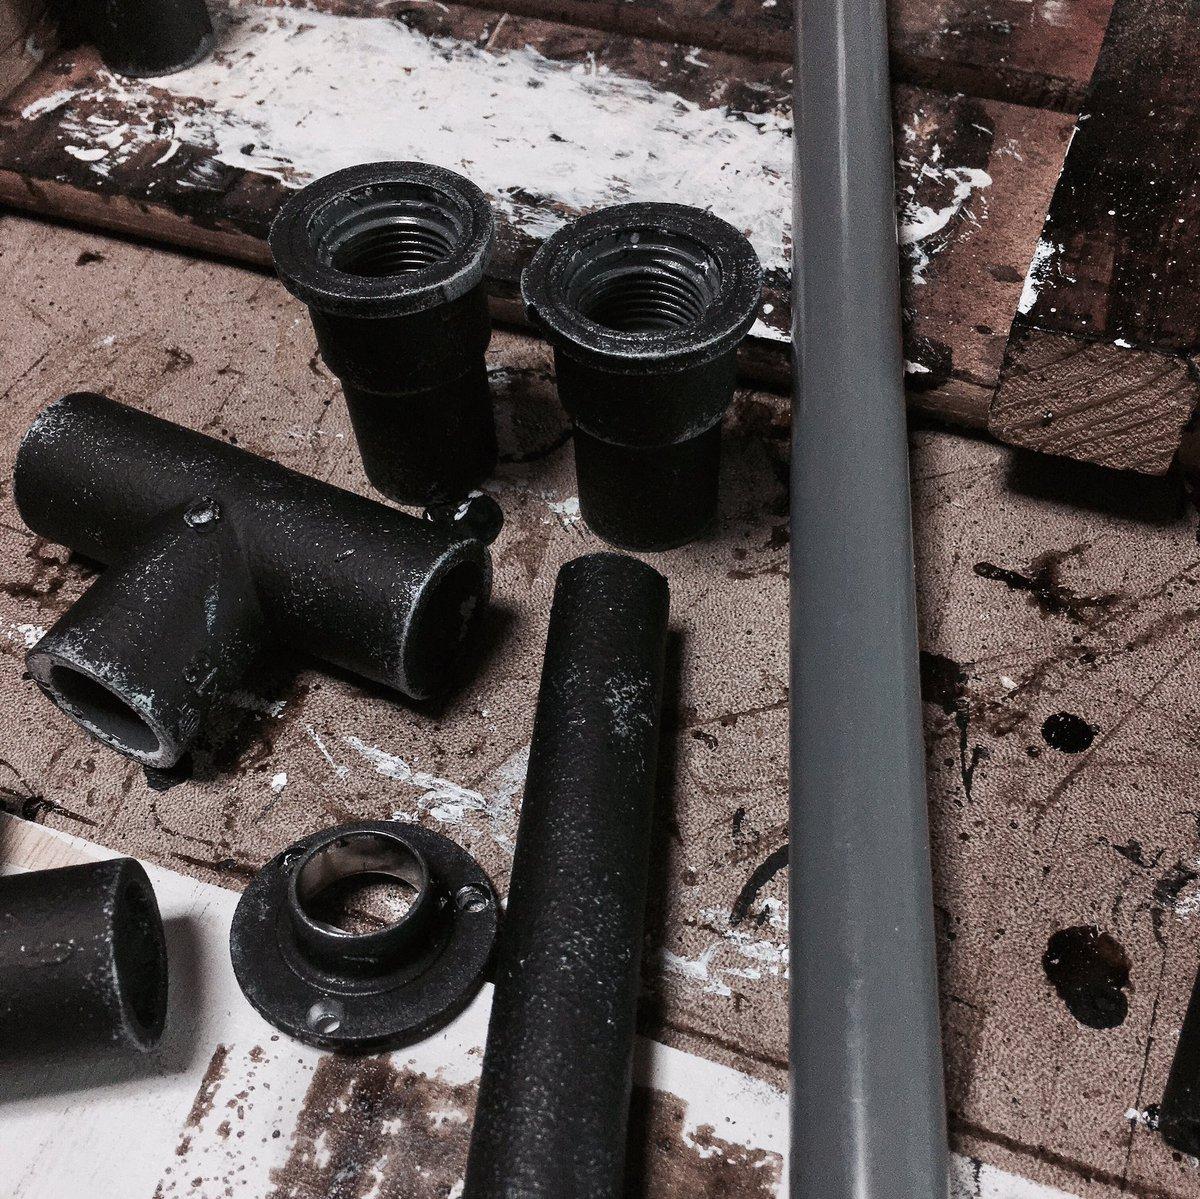 test ツイッターメディア - 初めての汚し加工! 塩ビパイプを黒系で塗装しました。  #インテリア #男前 #男前インテリア #100均 #リメイク #キャンドゥ #ダイソー #セリア #DIY #収納 #ディスプレイ #diyrepi #アンティーク #smilemind #リミア #塩ビパイプ #汚し加工 https://t.co/g6cey80pfz